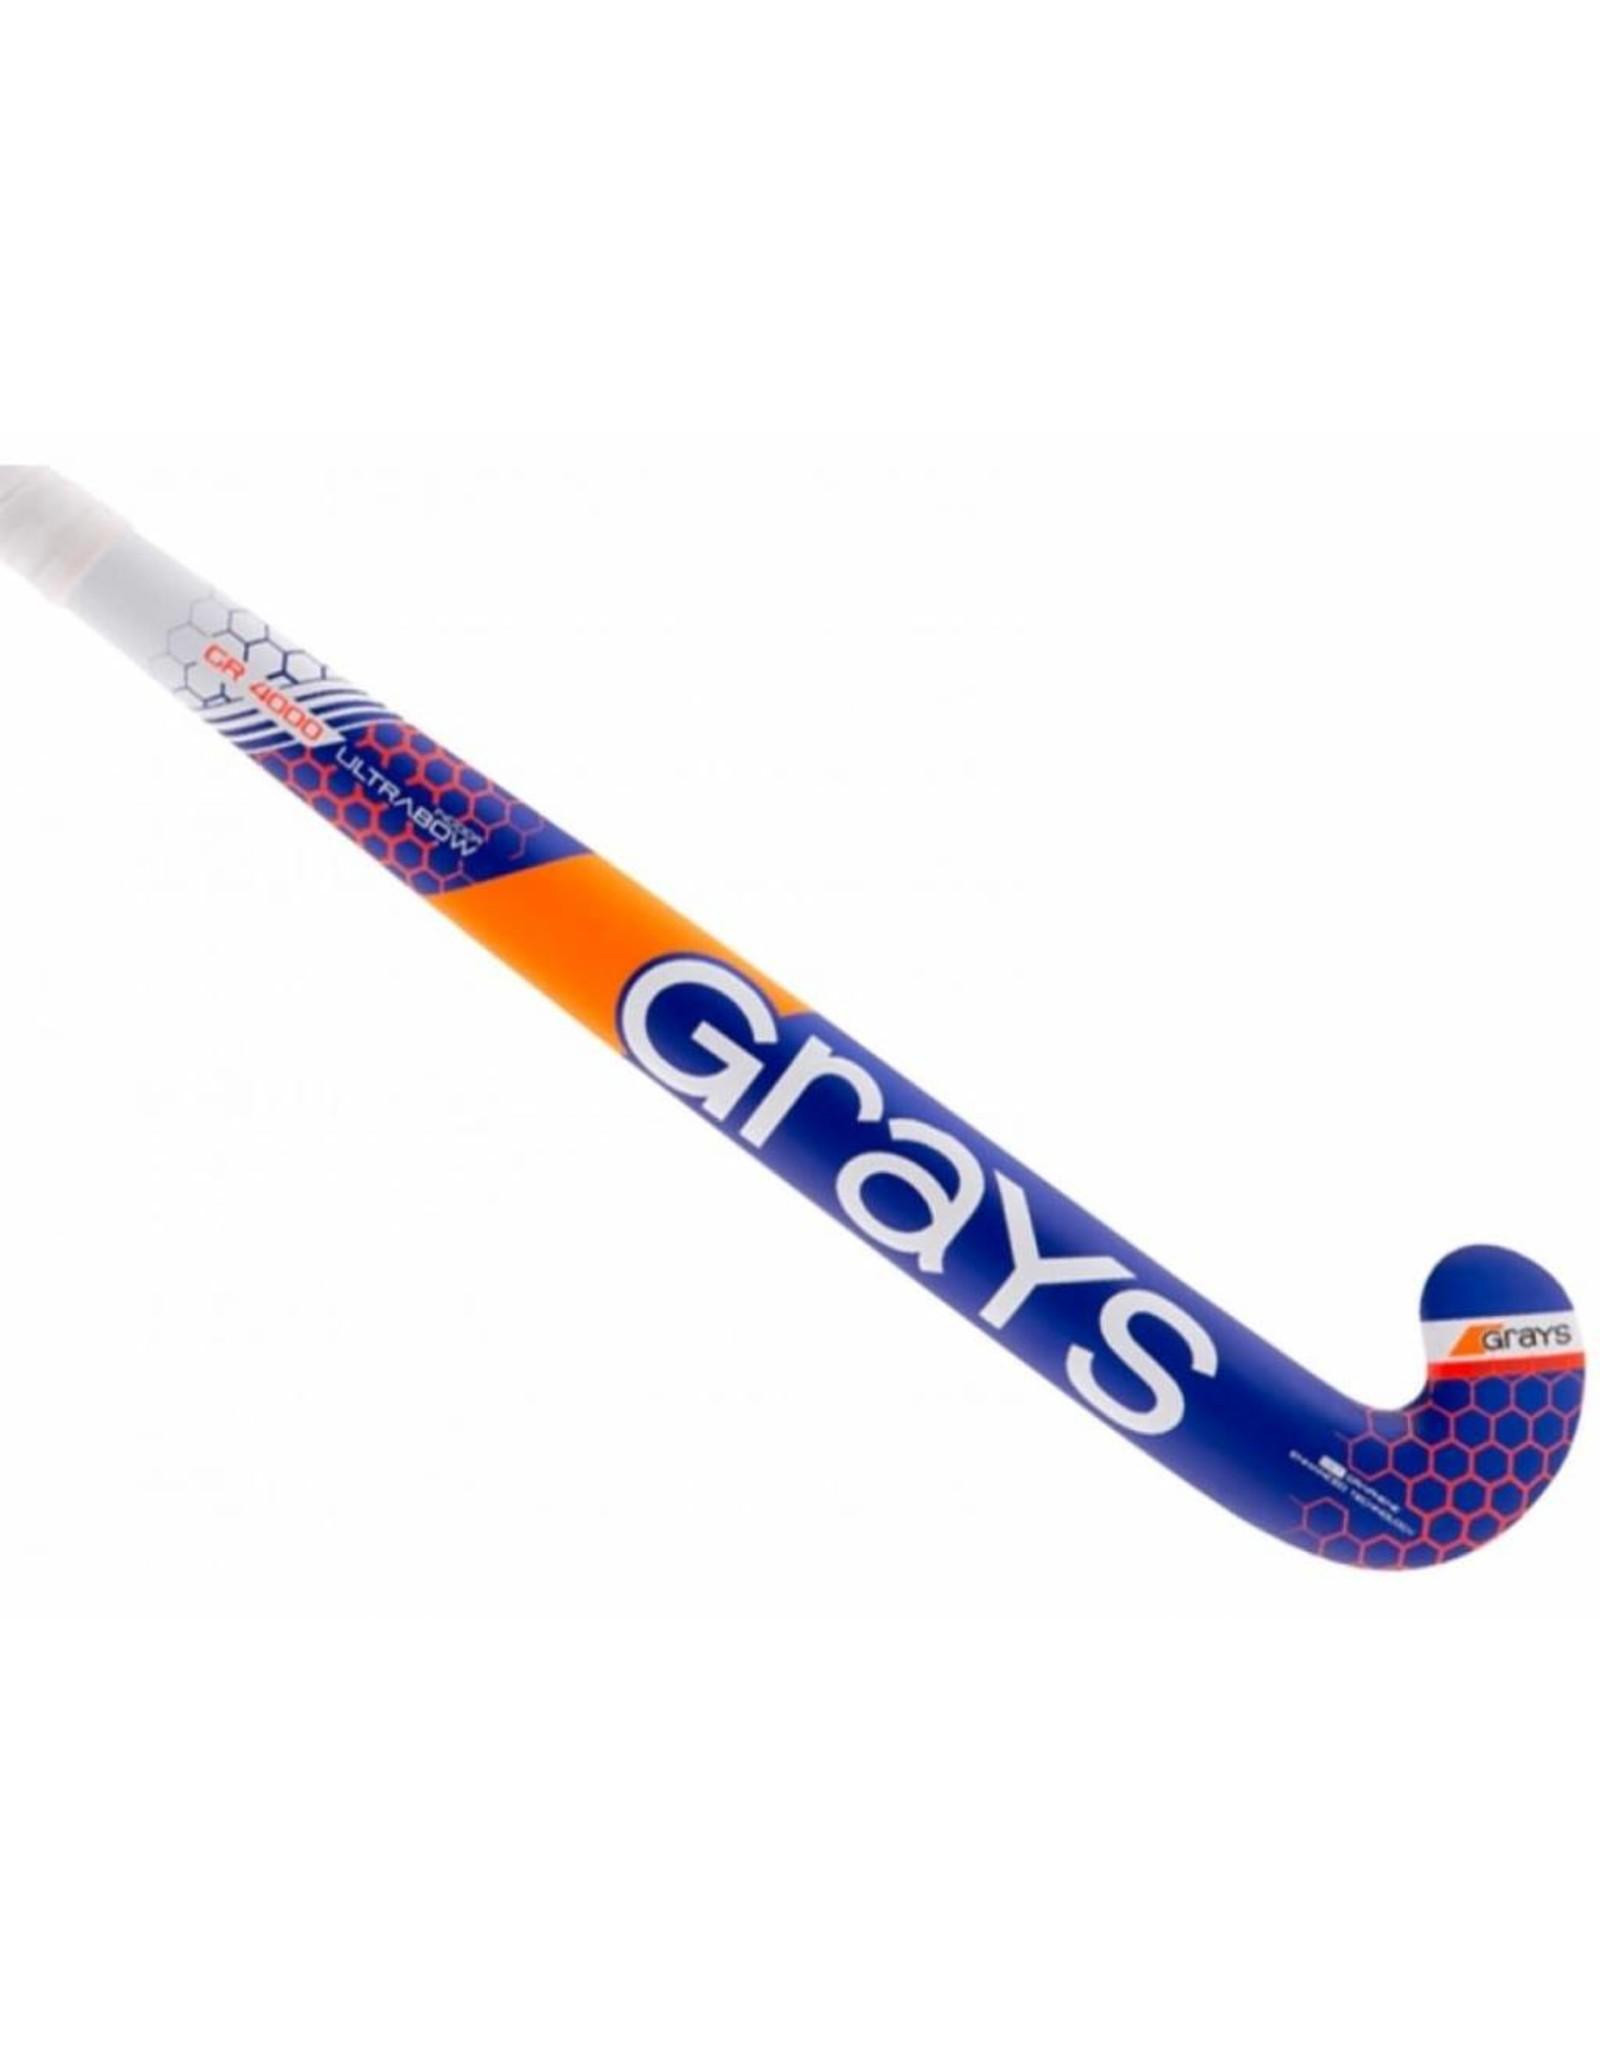 "GRAYS GRAYS GR4000 UB MICRO 34"" 17-18"